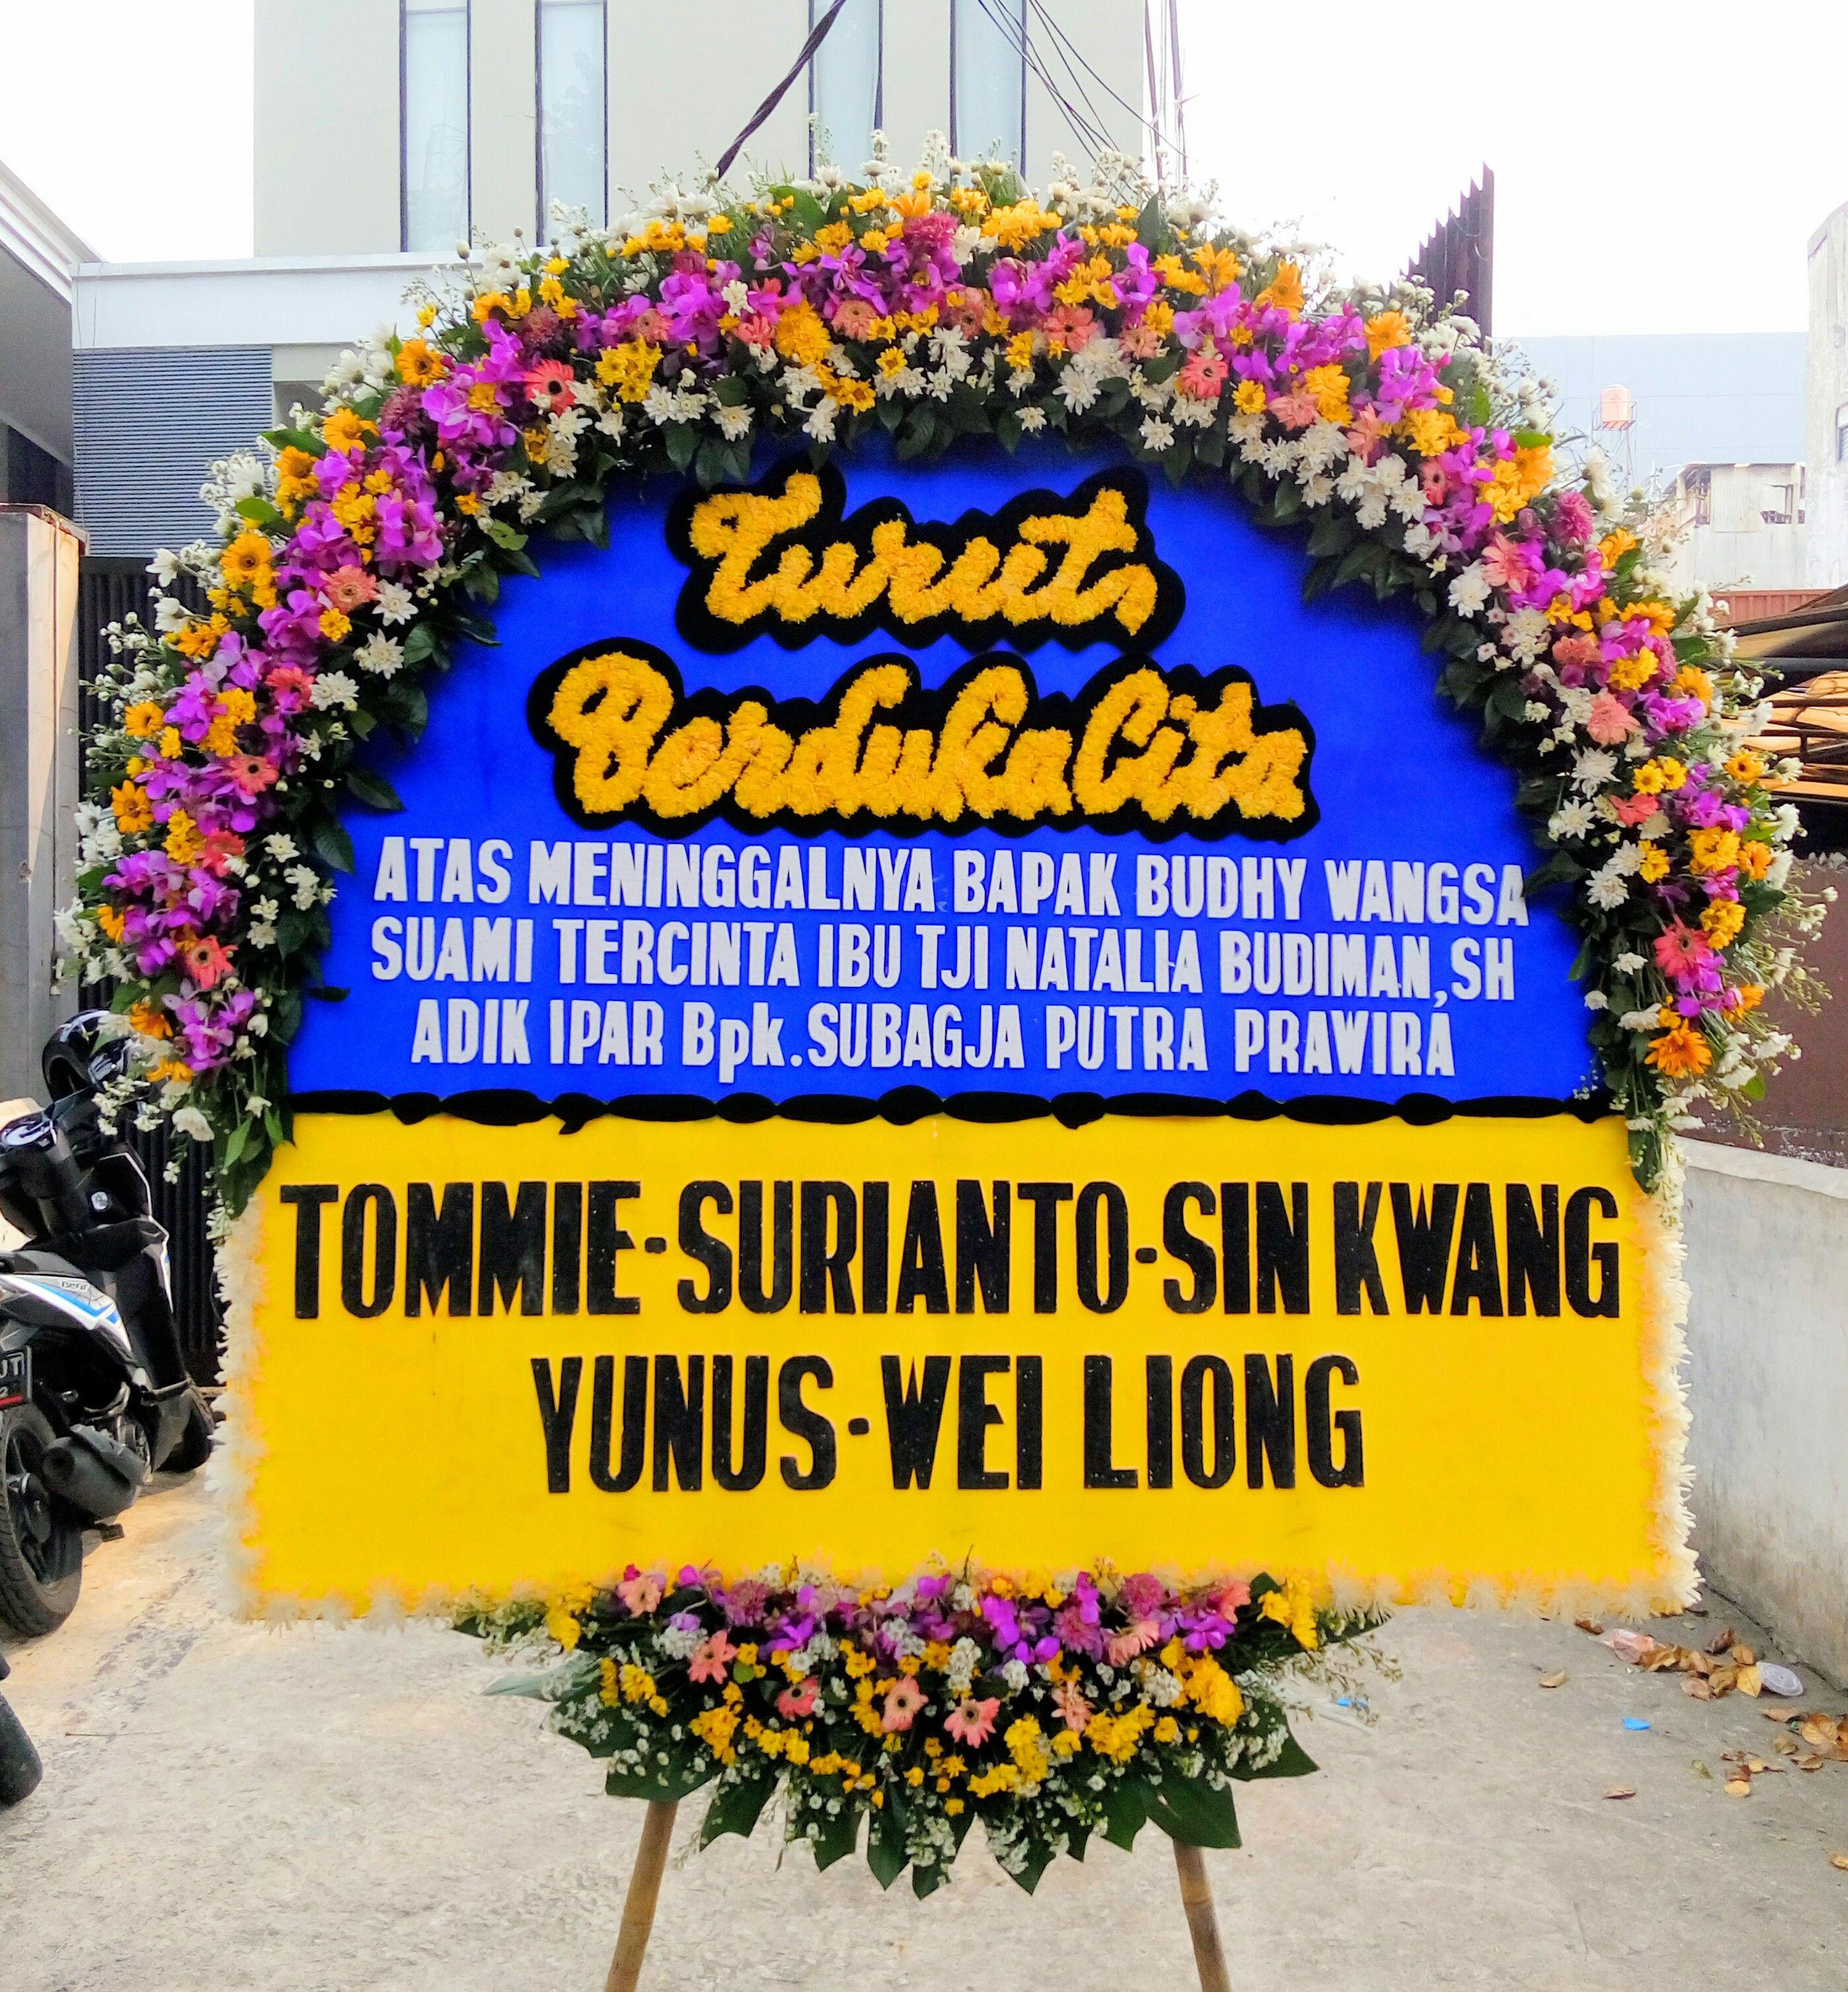 Toko Bunga Papan Duka Cita Terpercaya Di Jakarta Selatan Toko Bunga Bunga Rangkaian Bunga